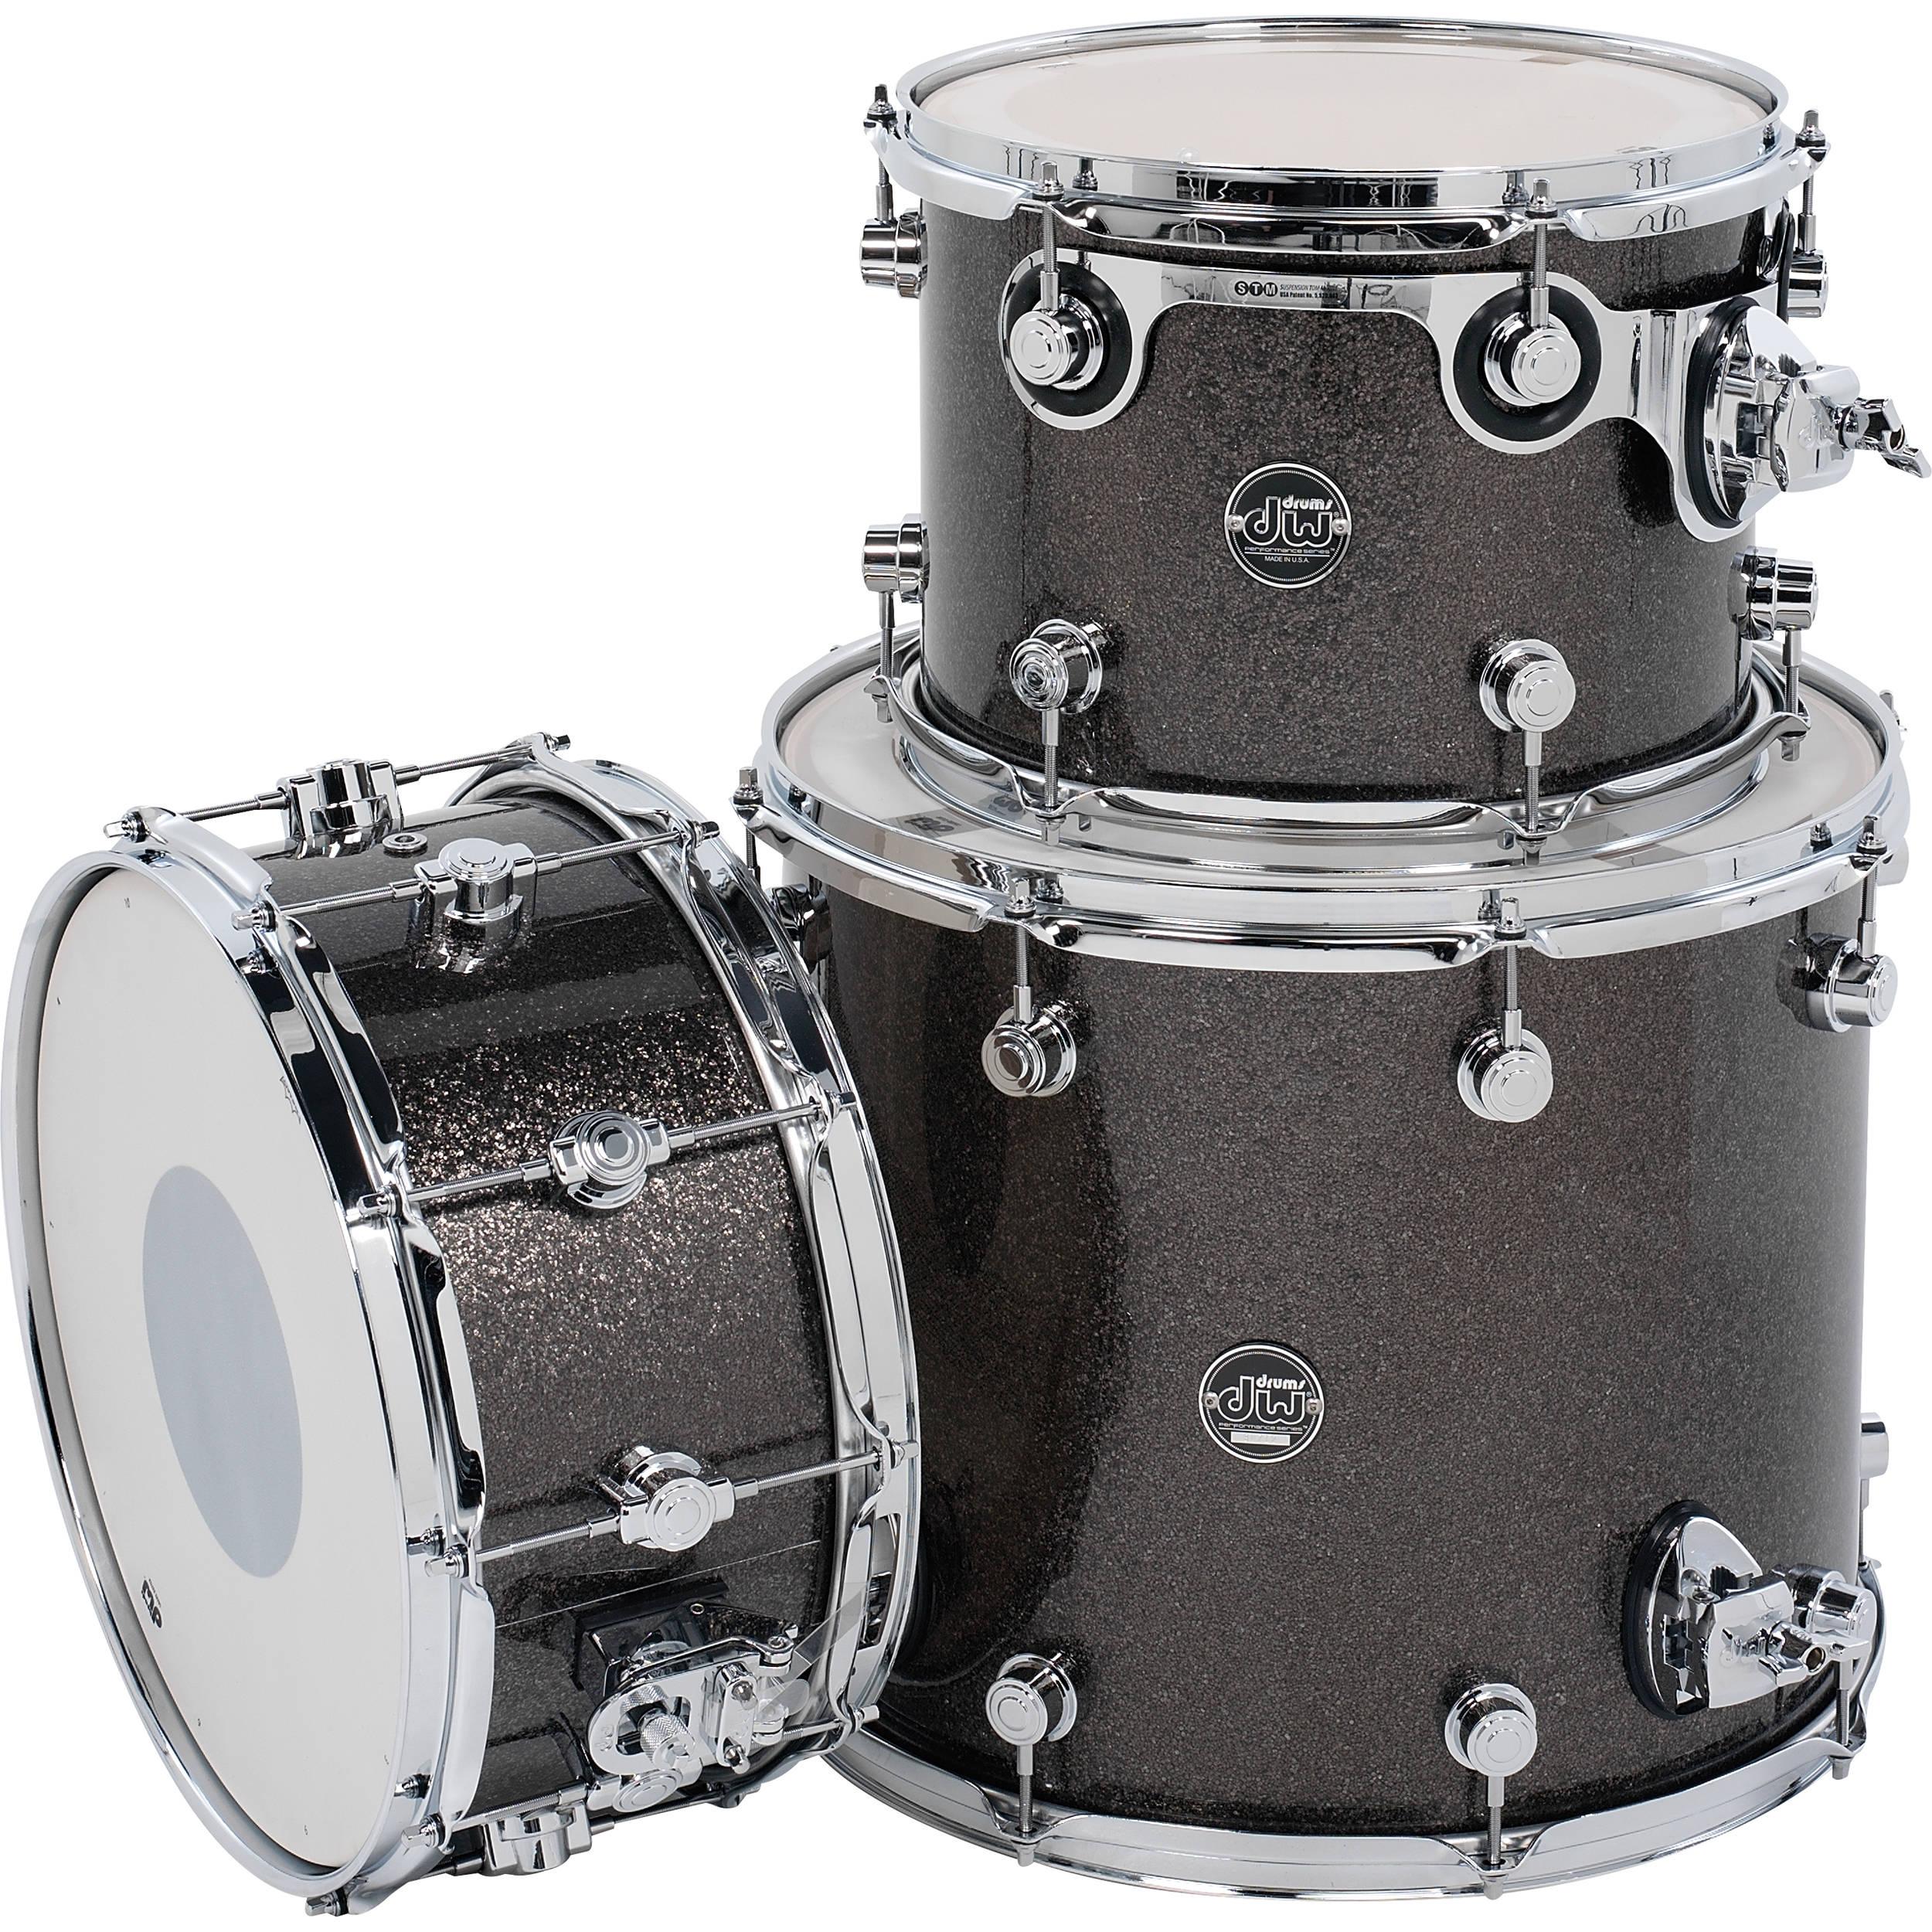 dw drums performance series 3 piece tom snare drum drpftmpk03ps. Black Bedroom Furniture Sets. Home Design Ideas